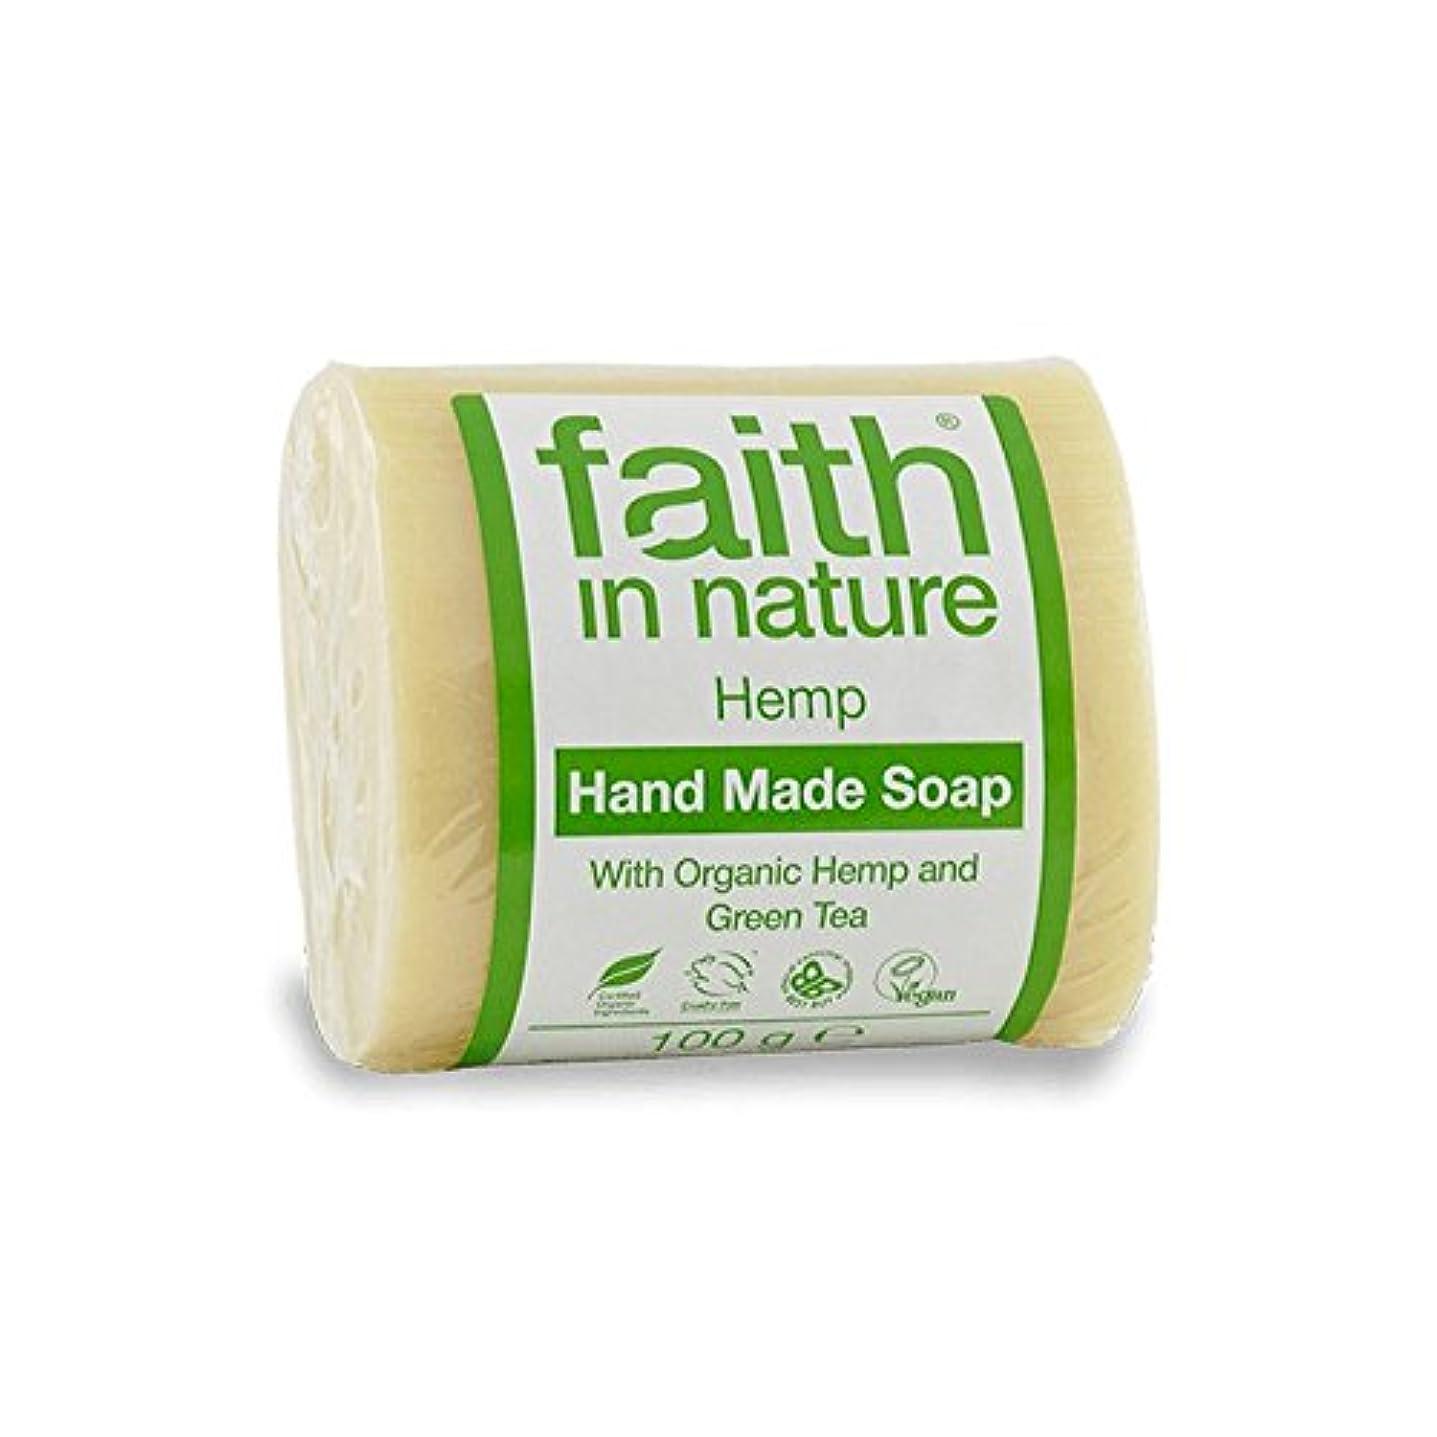 Faith in Nature Hemp with Green Tea Soap 100g (Pack of 2) - 緑茶石鹸100グラムと自然の麻の信仰 (x2) [並行輸入品]